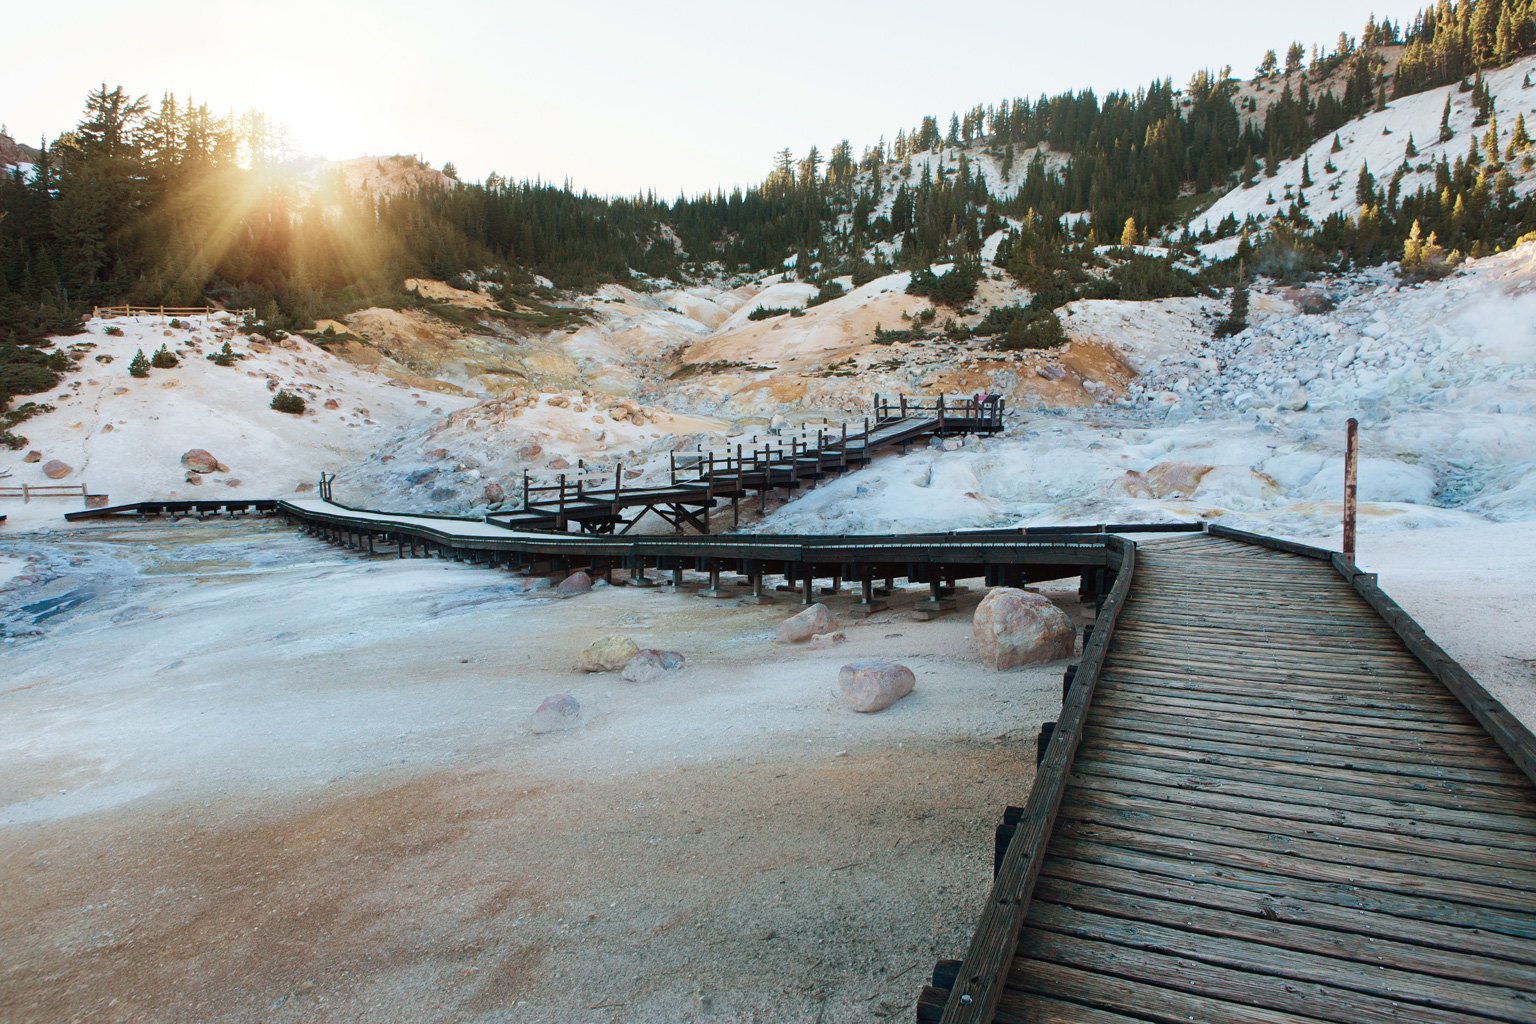 CindyGiovagnoli_Lassen_Volcanic_National_Park_California_camp_road_trip-019.jpg